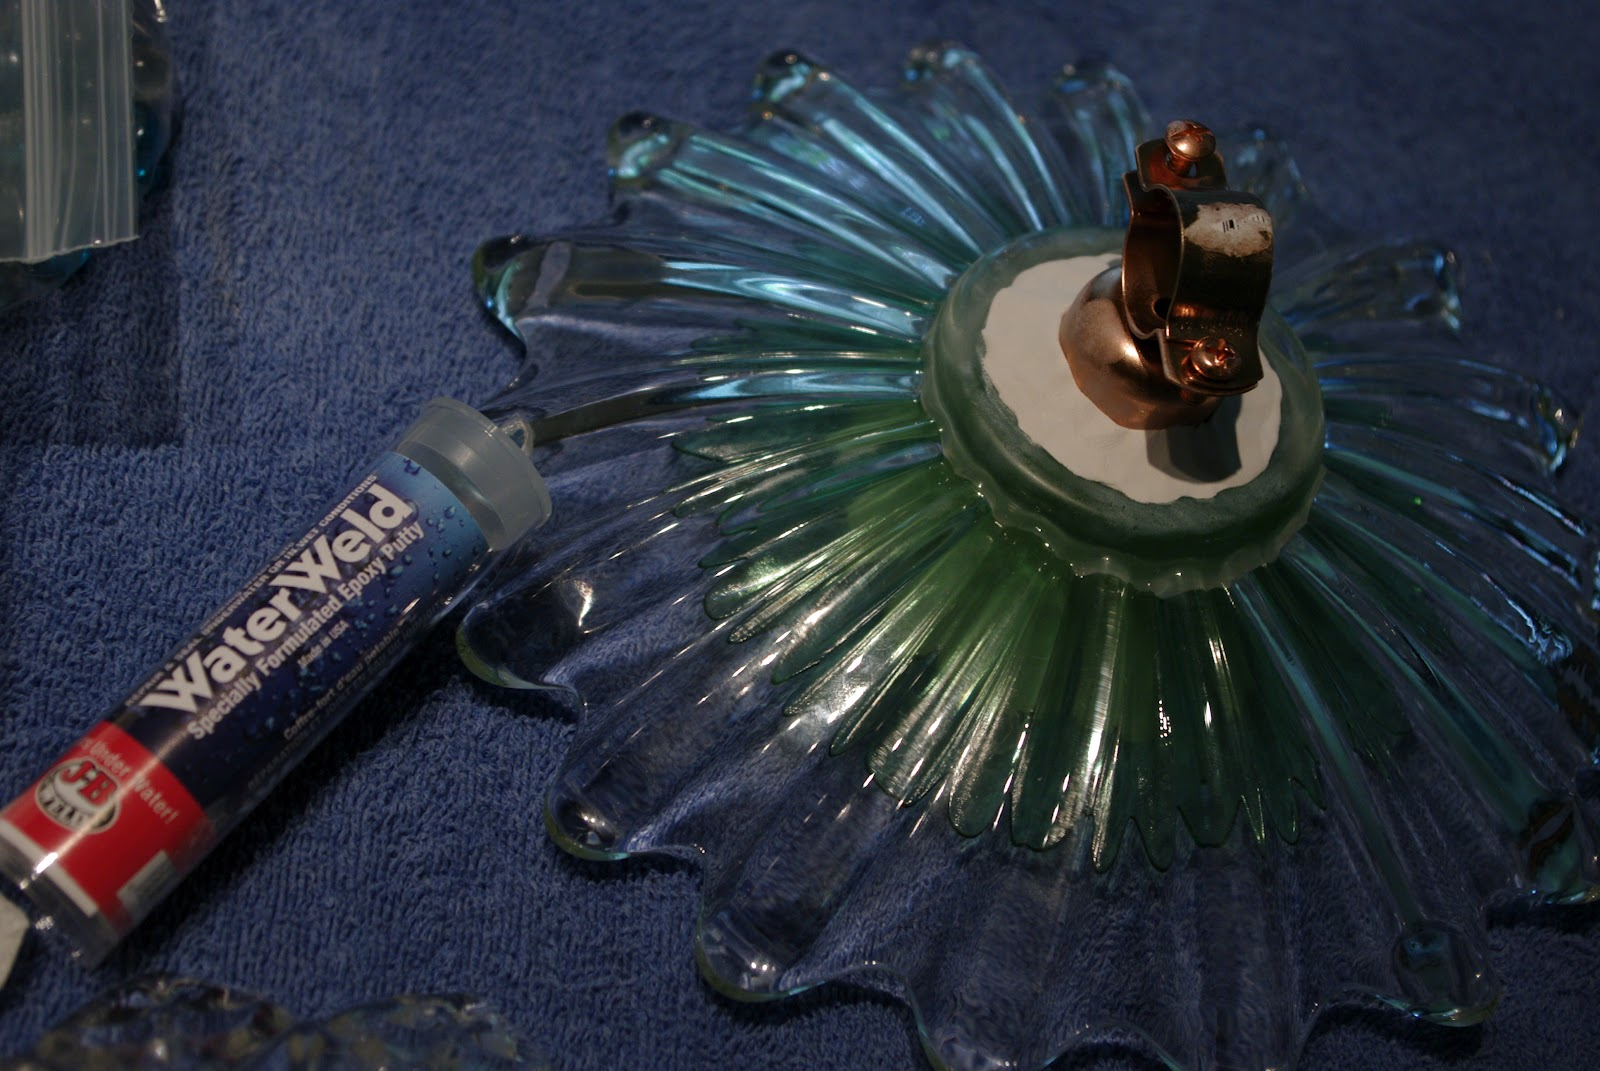 Glass garden flowers http www homelifescience com 2012 05 making